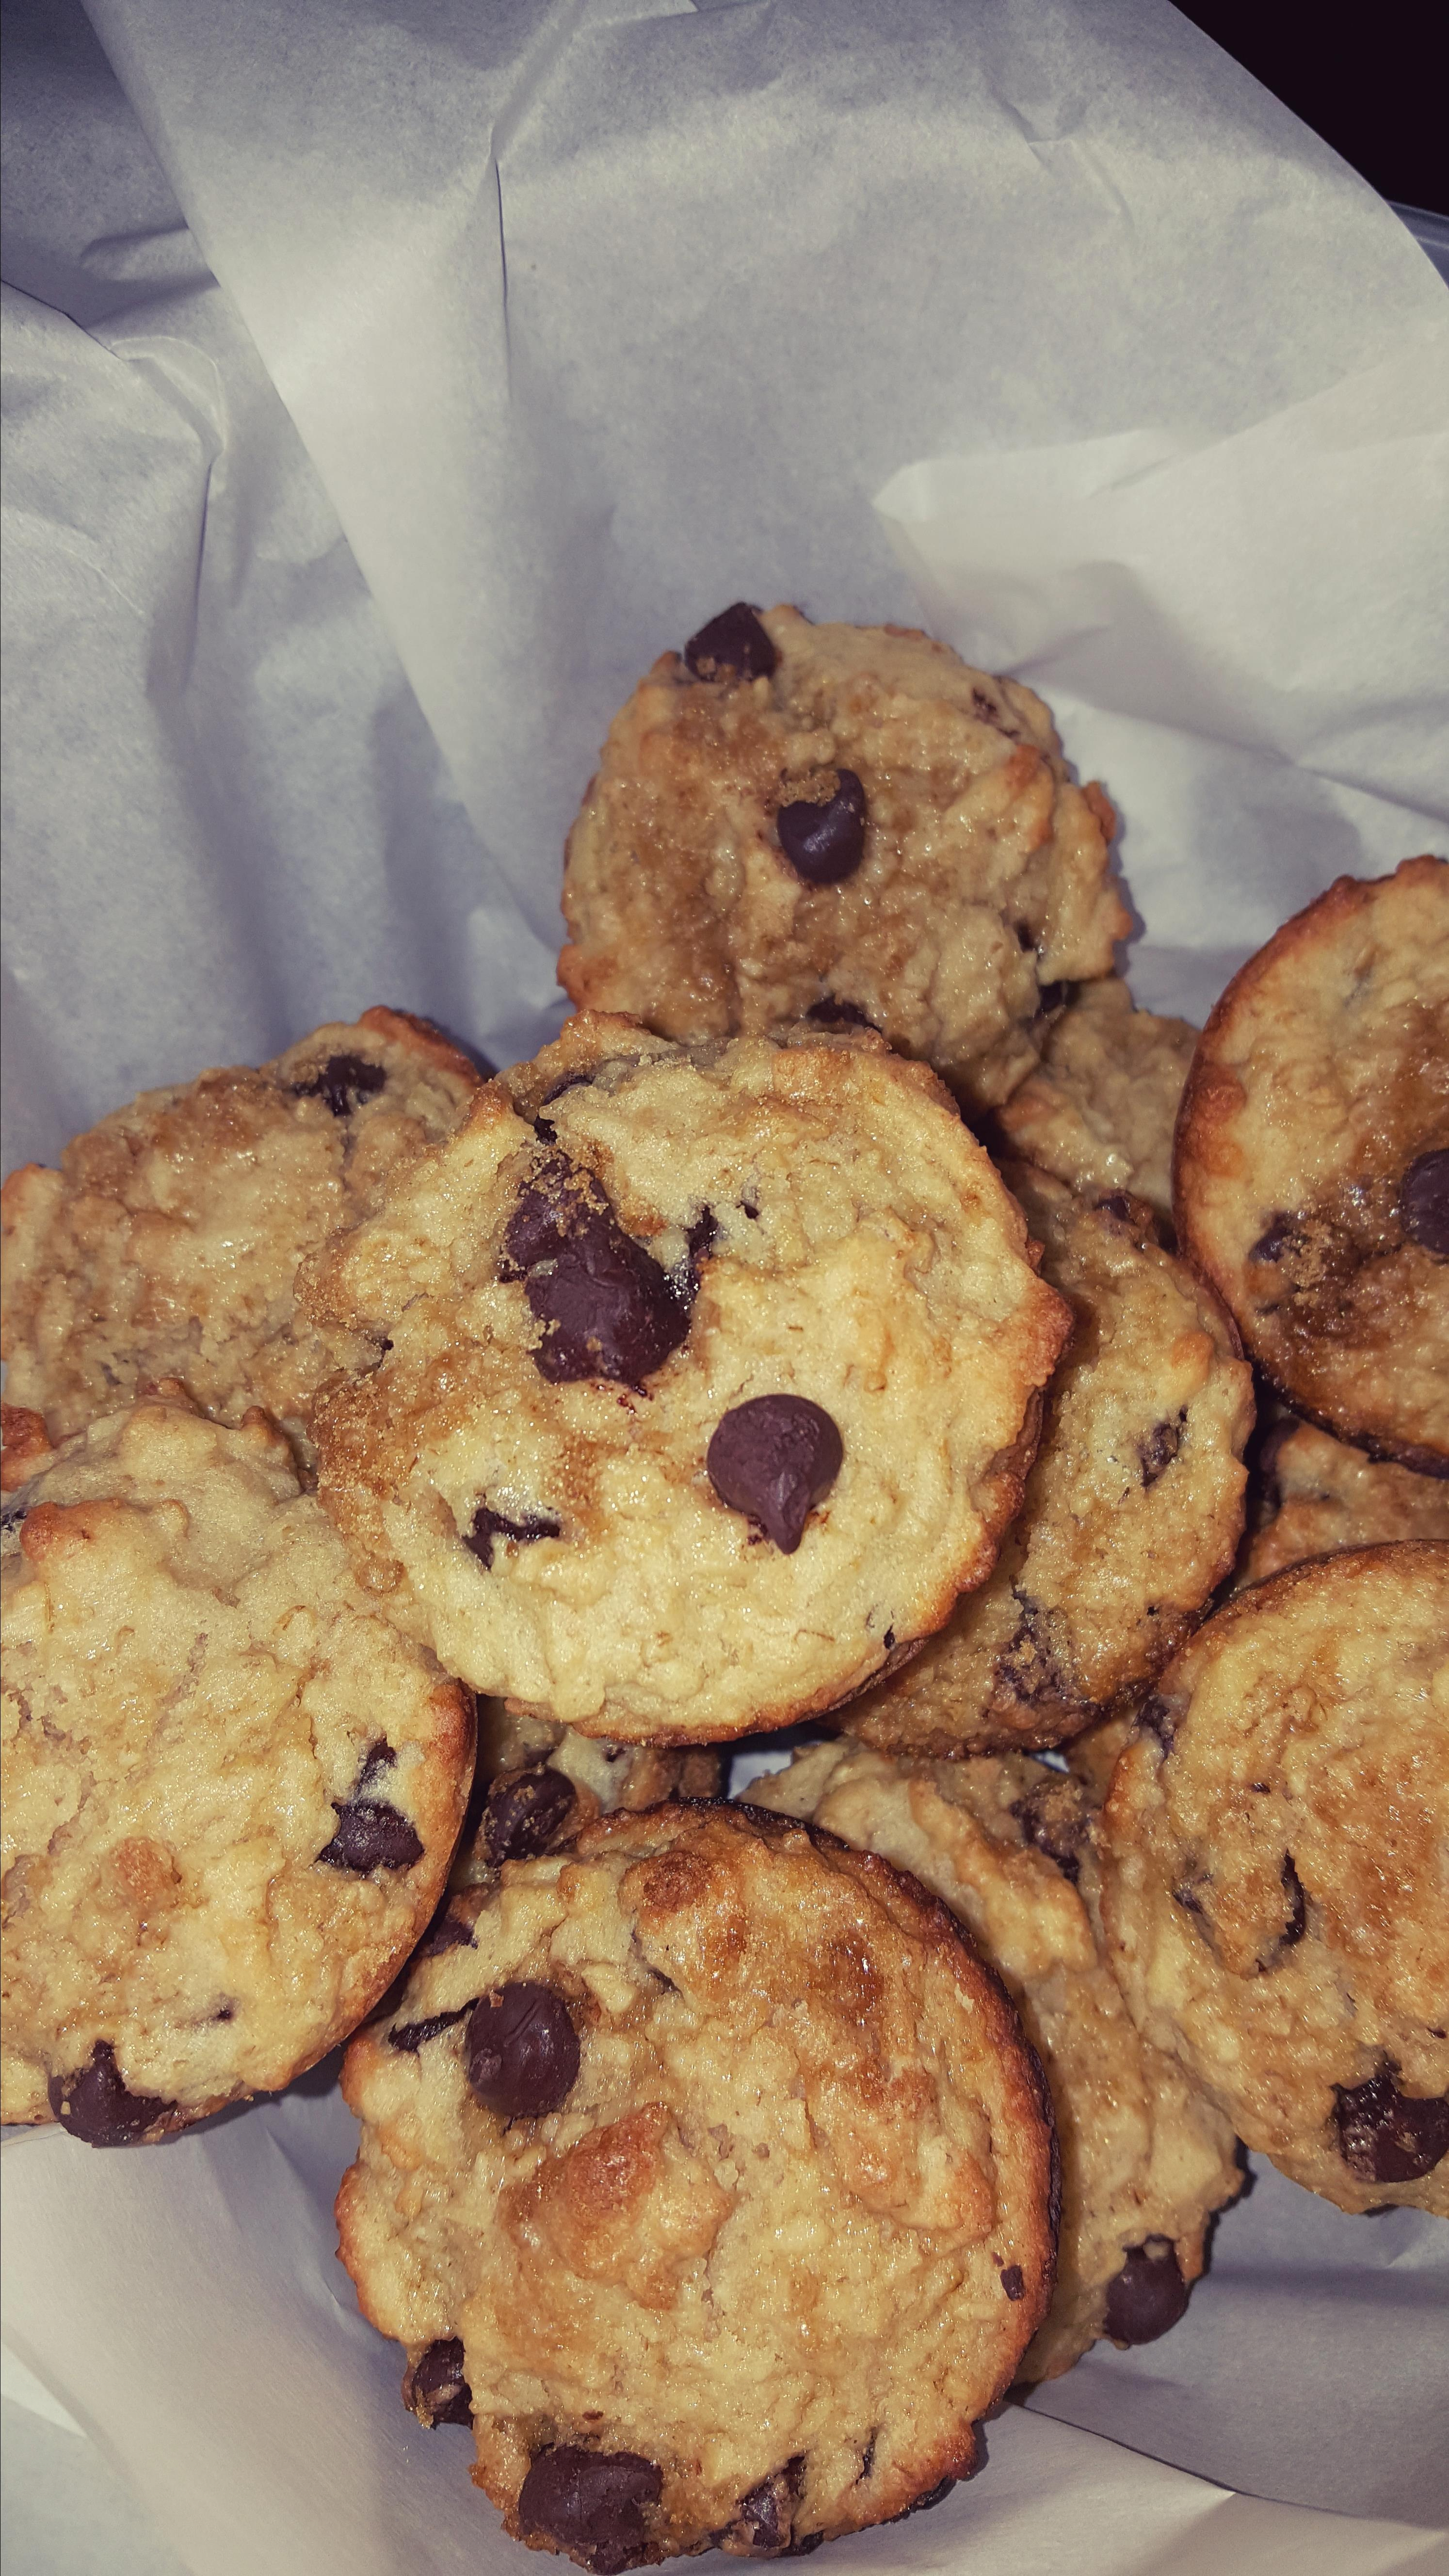 Oatmeal Chocolate Chip Muffins Buzzy Jordan